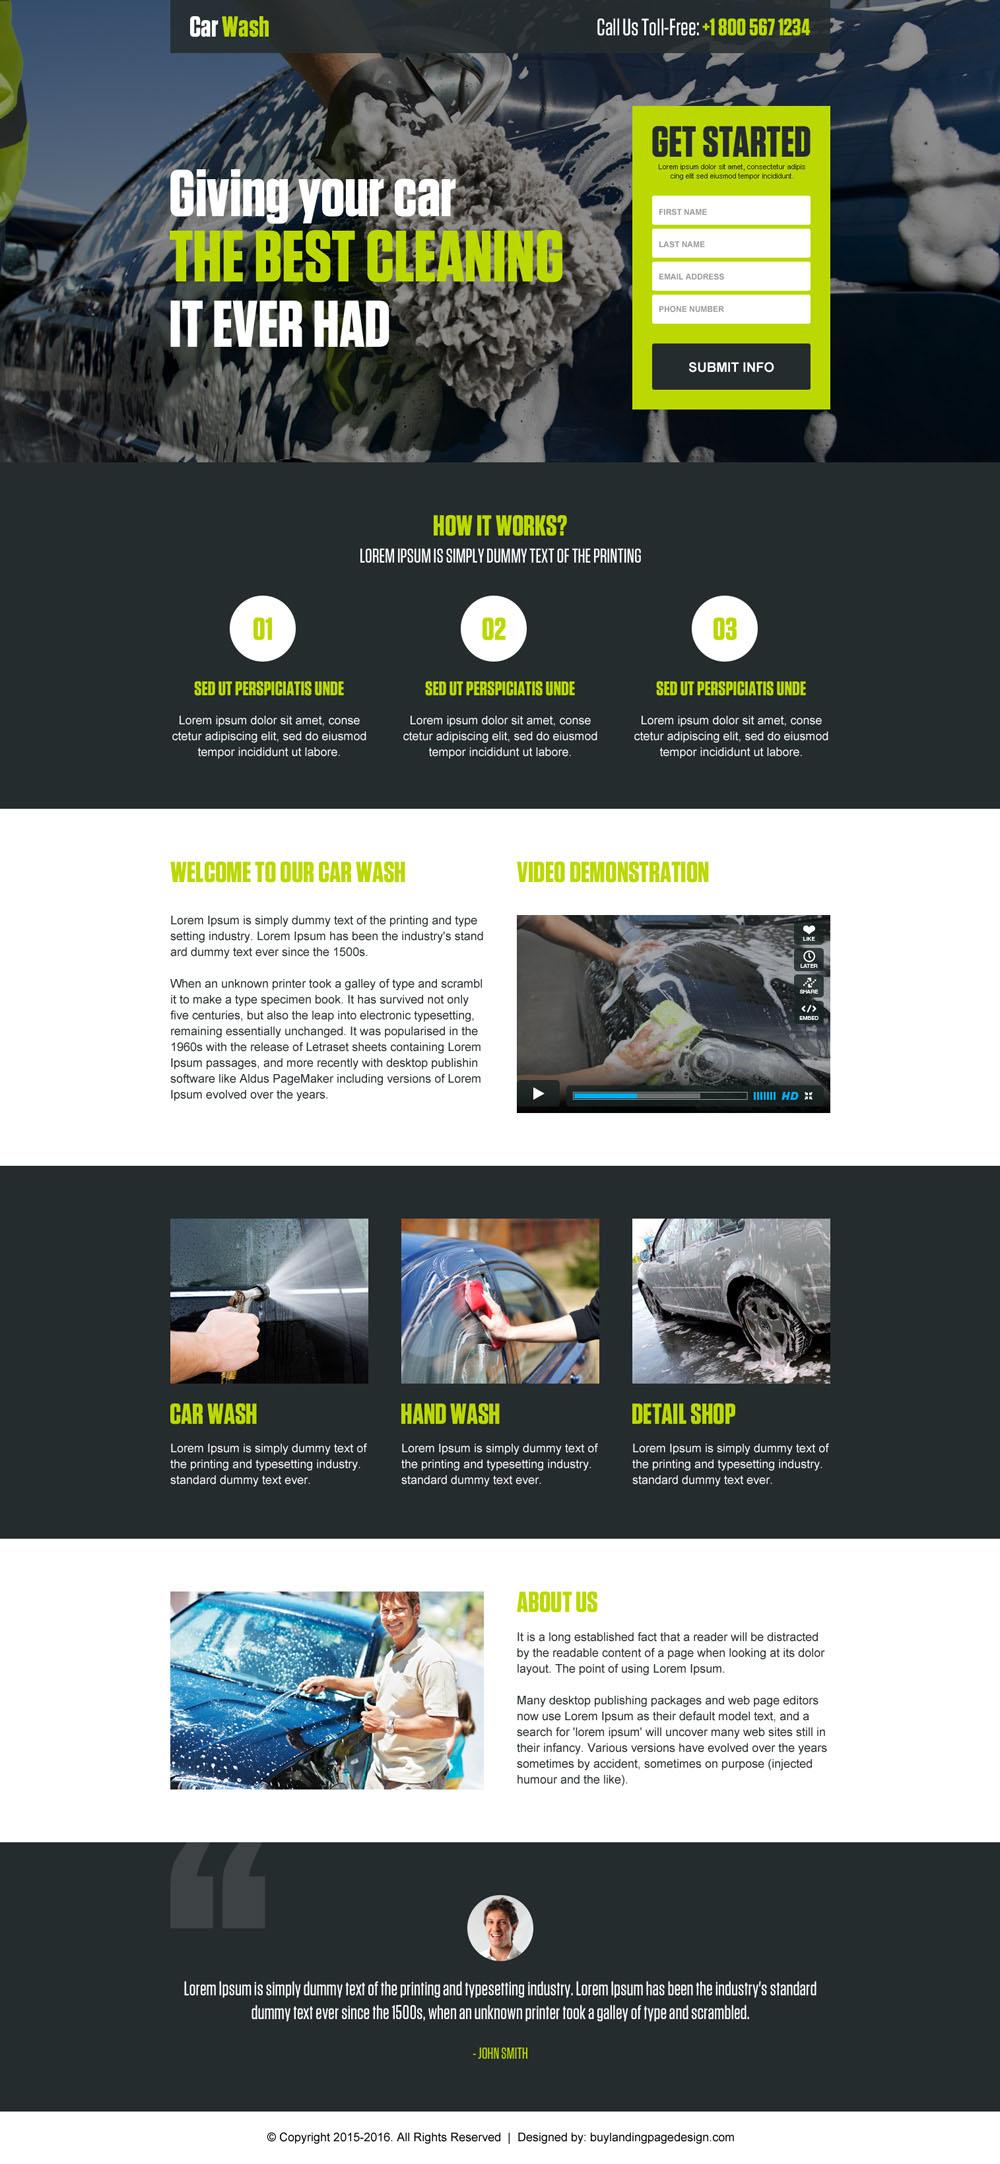 best-car-wash-service-lead-generation-landing-page-design-001